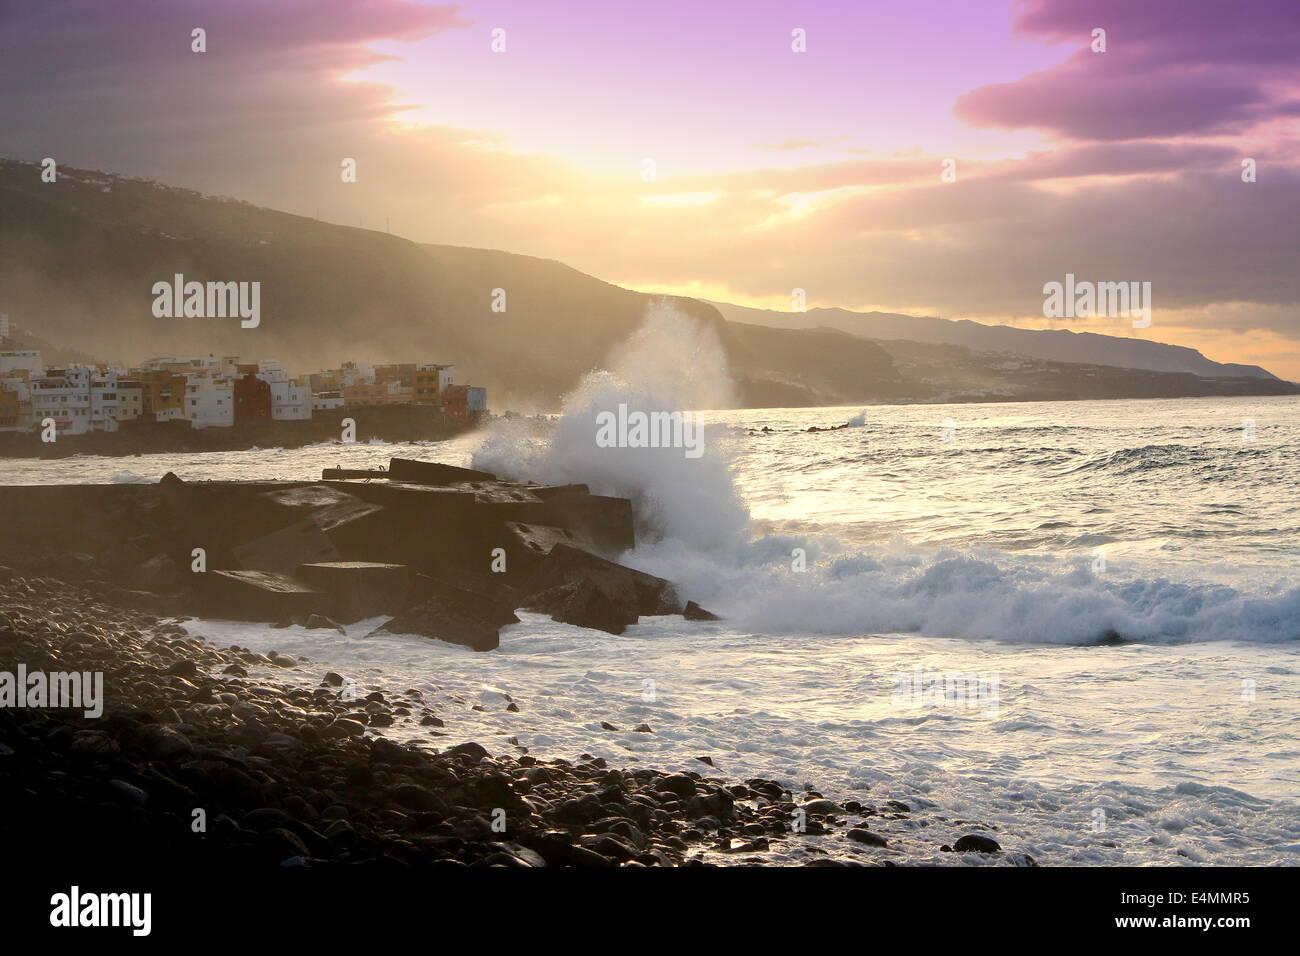 Pounding surf and meters high waves on the Atlantic Ocean coast of Puerto de la Cruz, Tenerife, Spain at sunset, - Stock Image